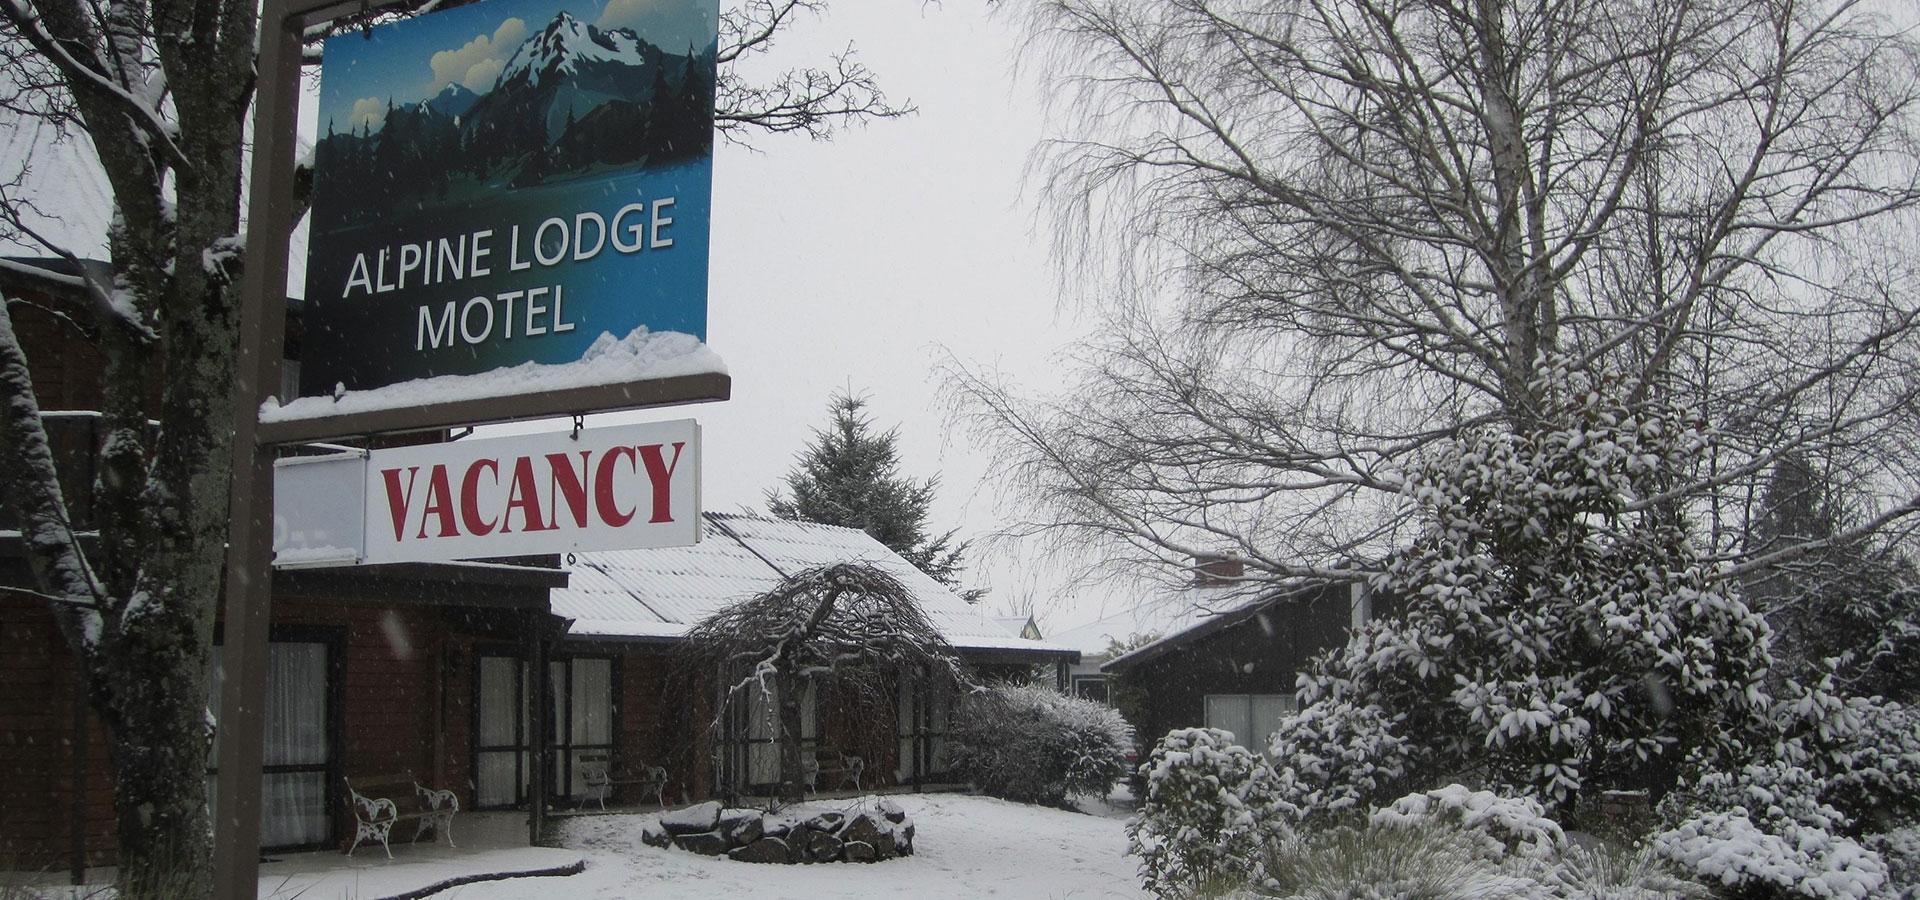 Alpine Lodge Motel